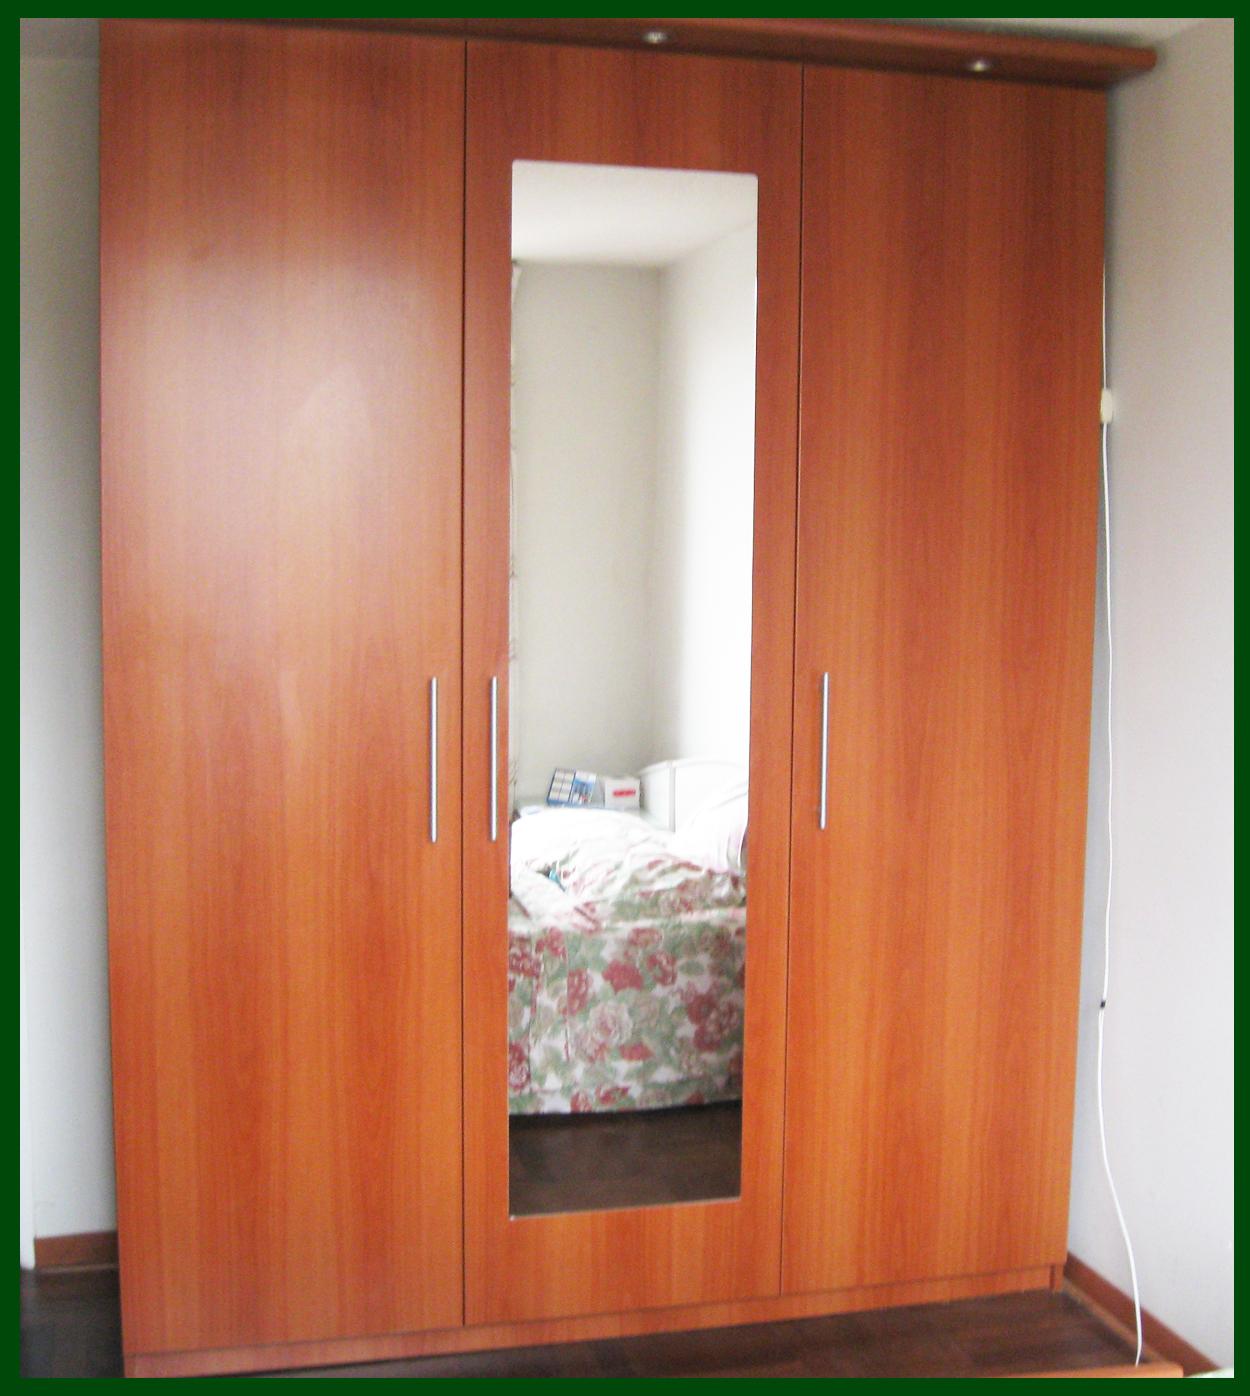 Muebles decoratiba adolfo ibarra v closet 03 puertas - Tiradores para puertas ...